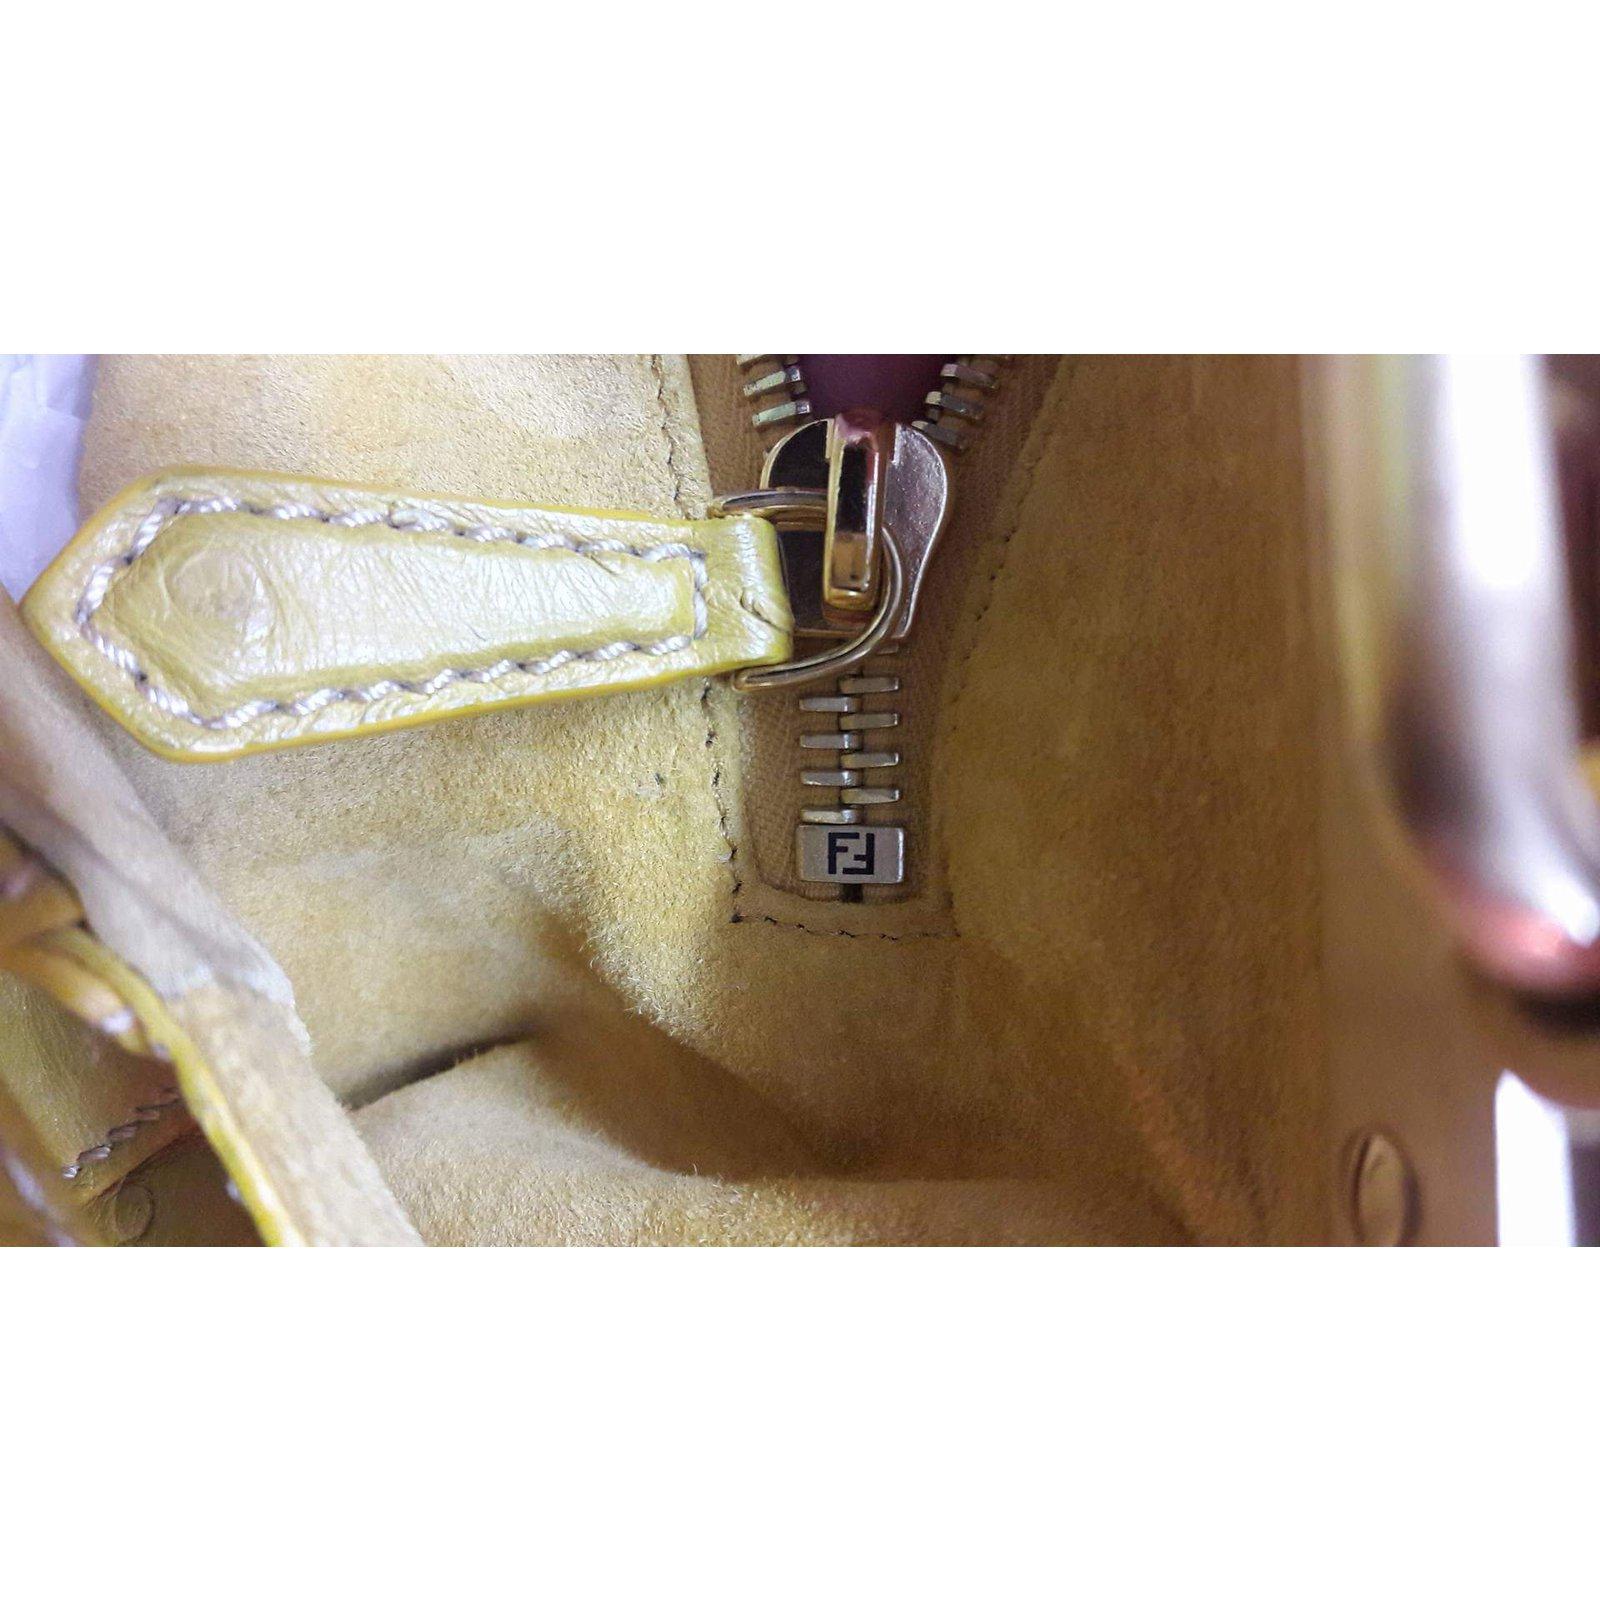 251fd2715d4e Fendi Ostrich Peekaboo Handbags Exotic leather Yellow ref.62950 - Joli  Closet